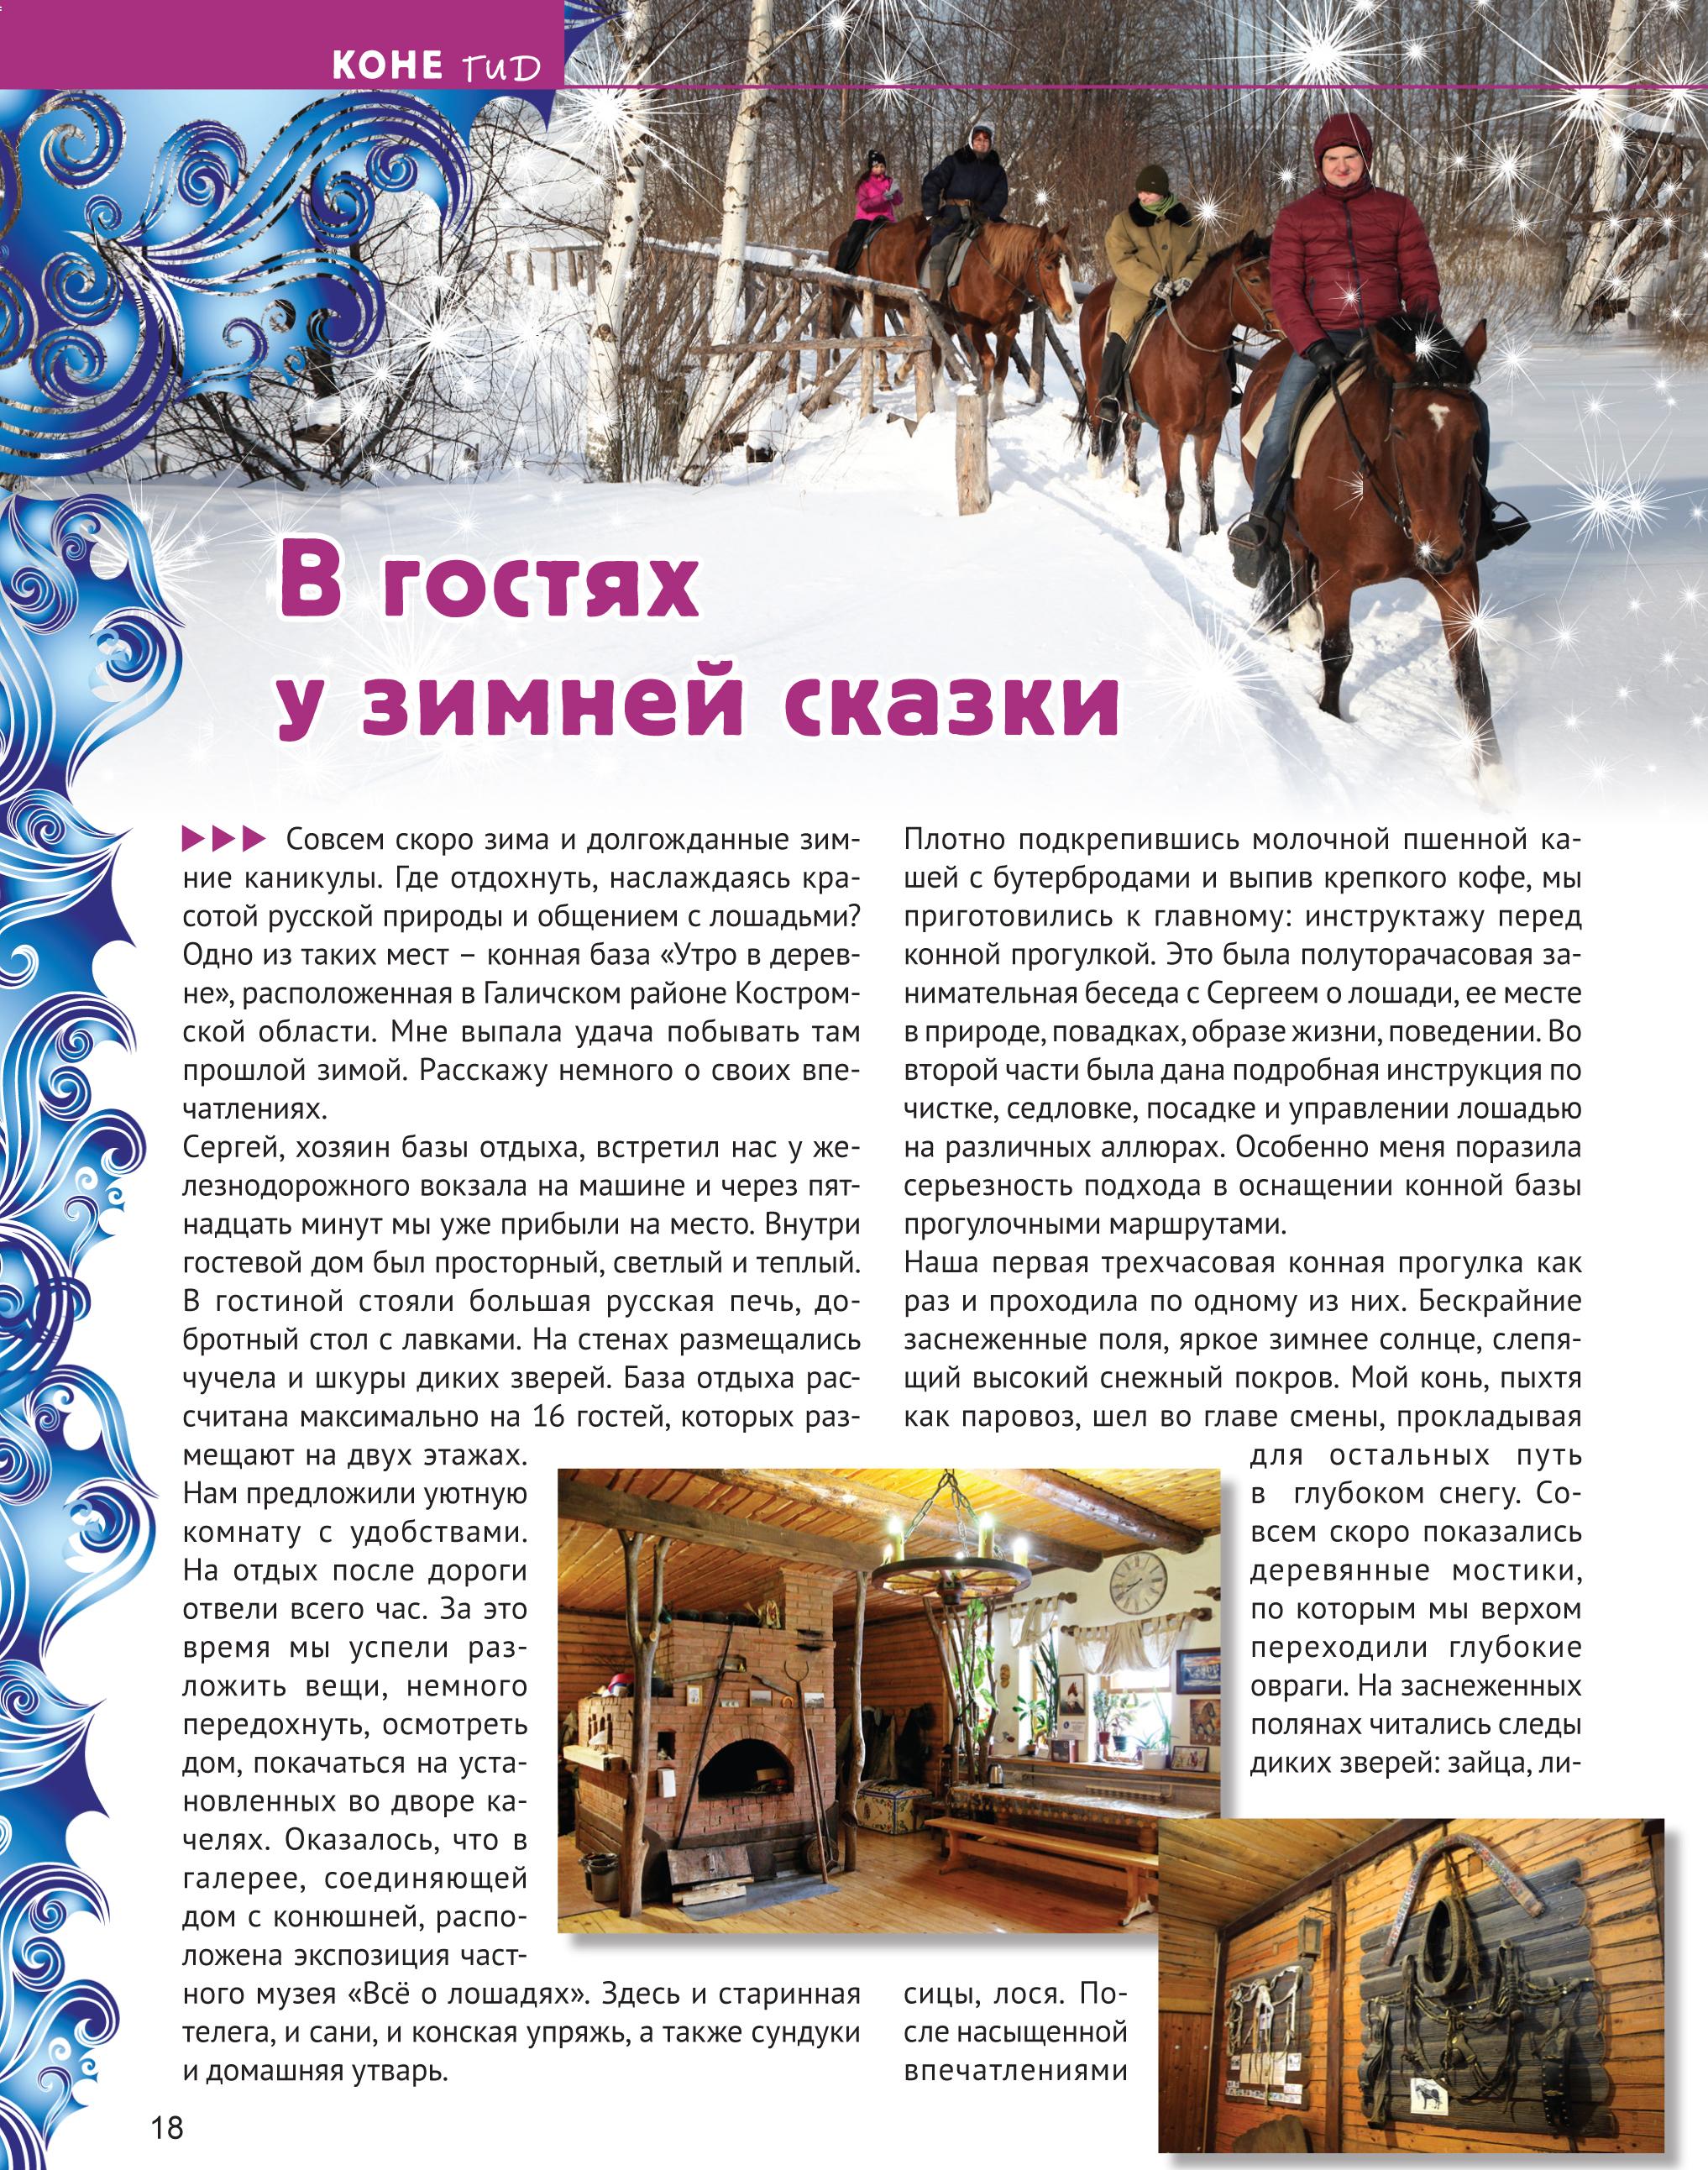 Book KONEVODITEL 62018 print-18